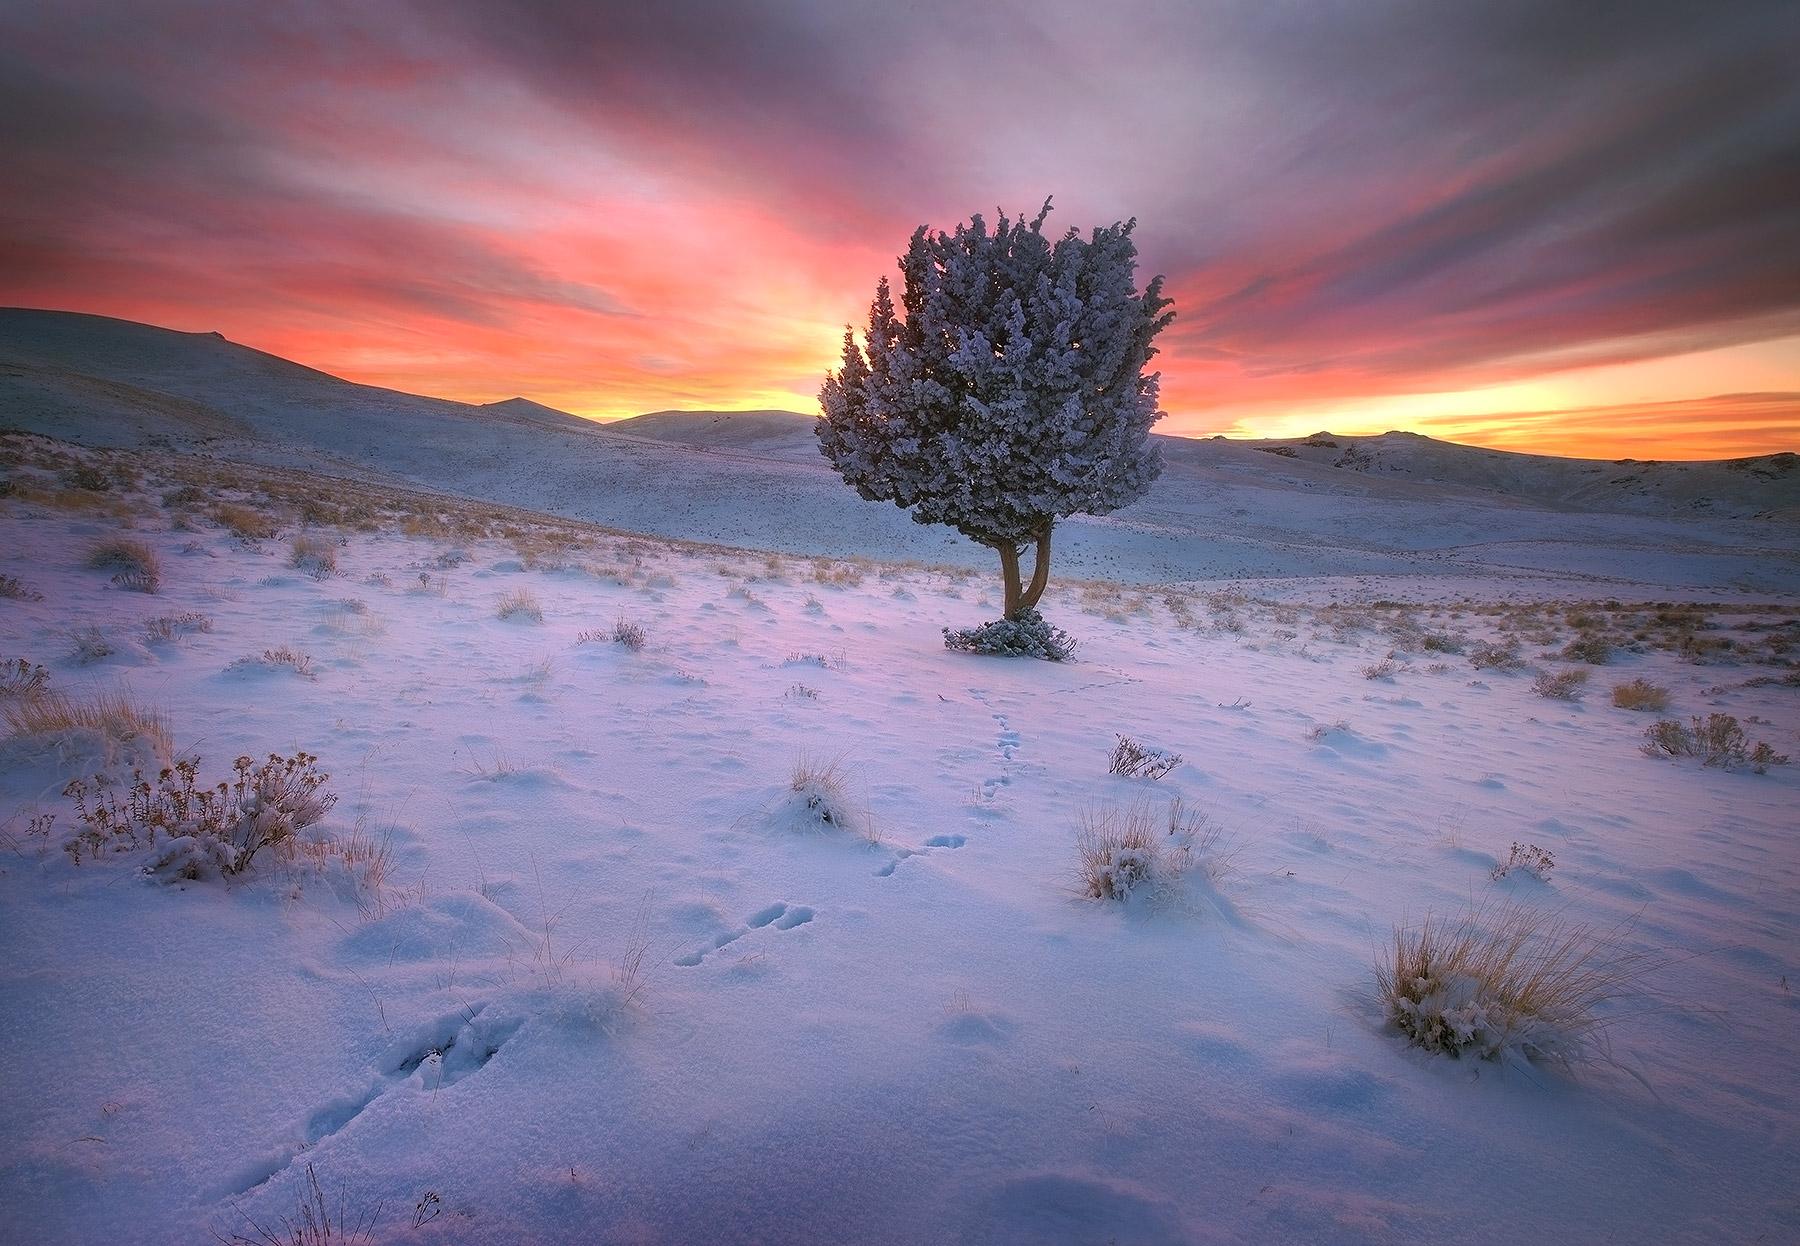 Juniper, Tree, Snow, Sunset, Jack-rabbit, Owyhee, Oregon, Remote, photo